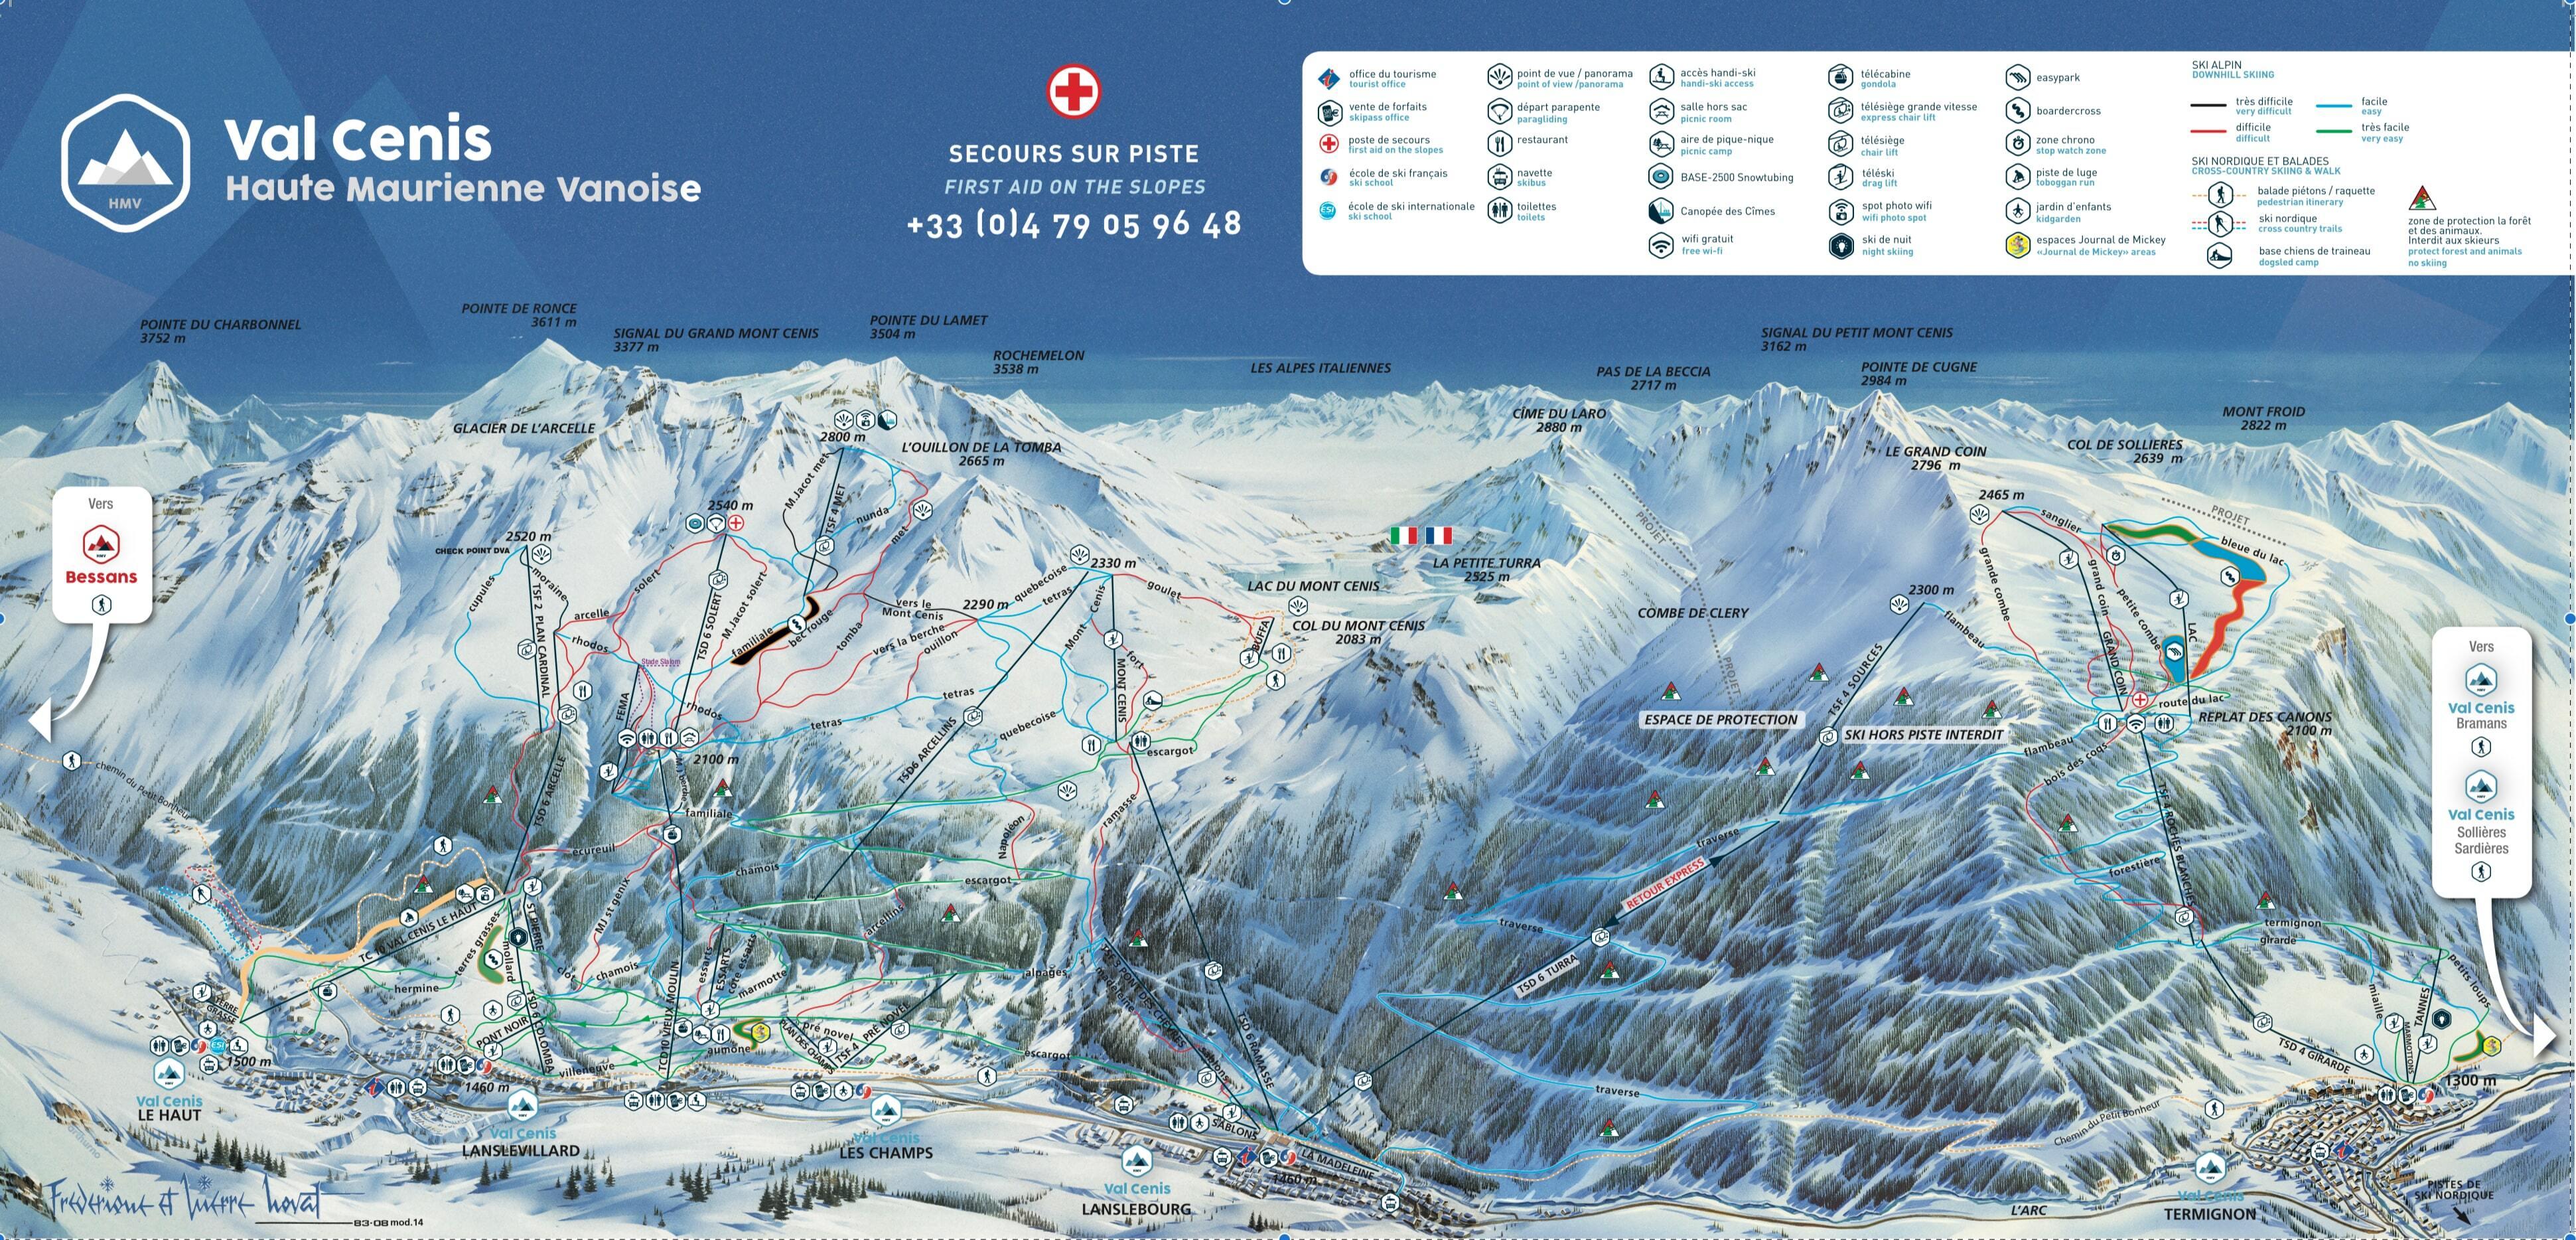 Val Cenis Piste / Trail Map